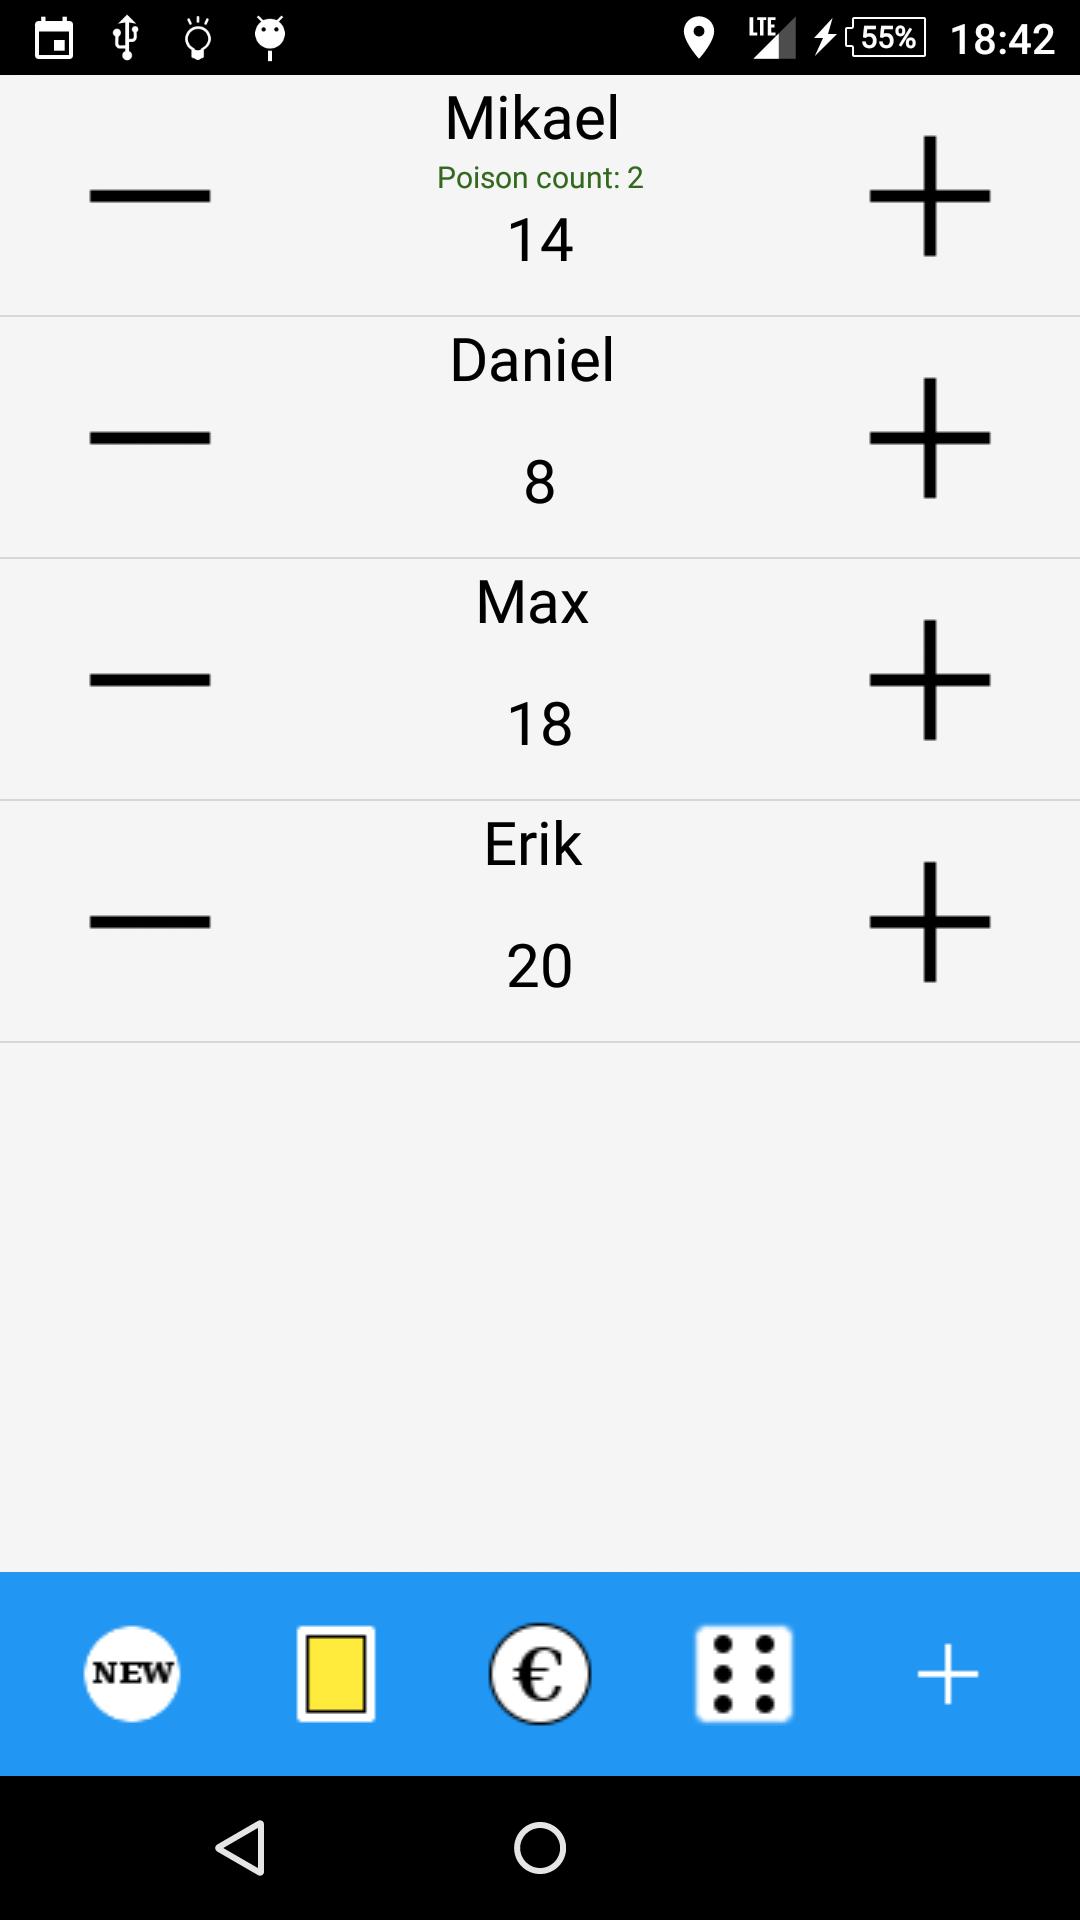 phone_ui_multi_player_mode